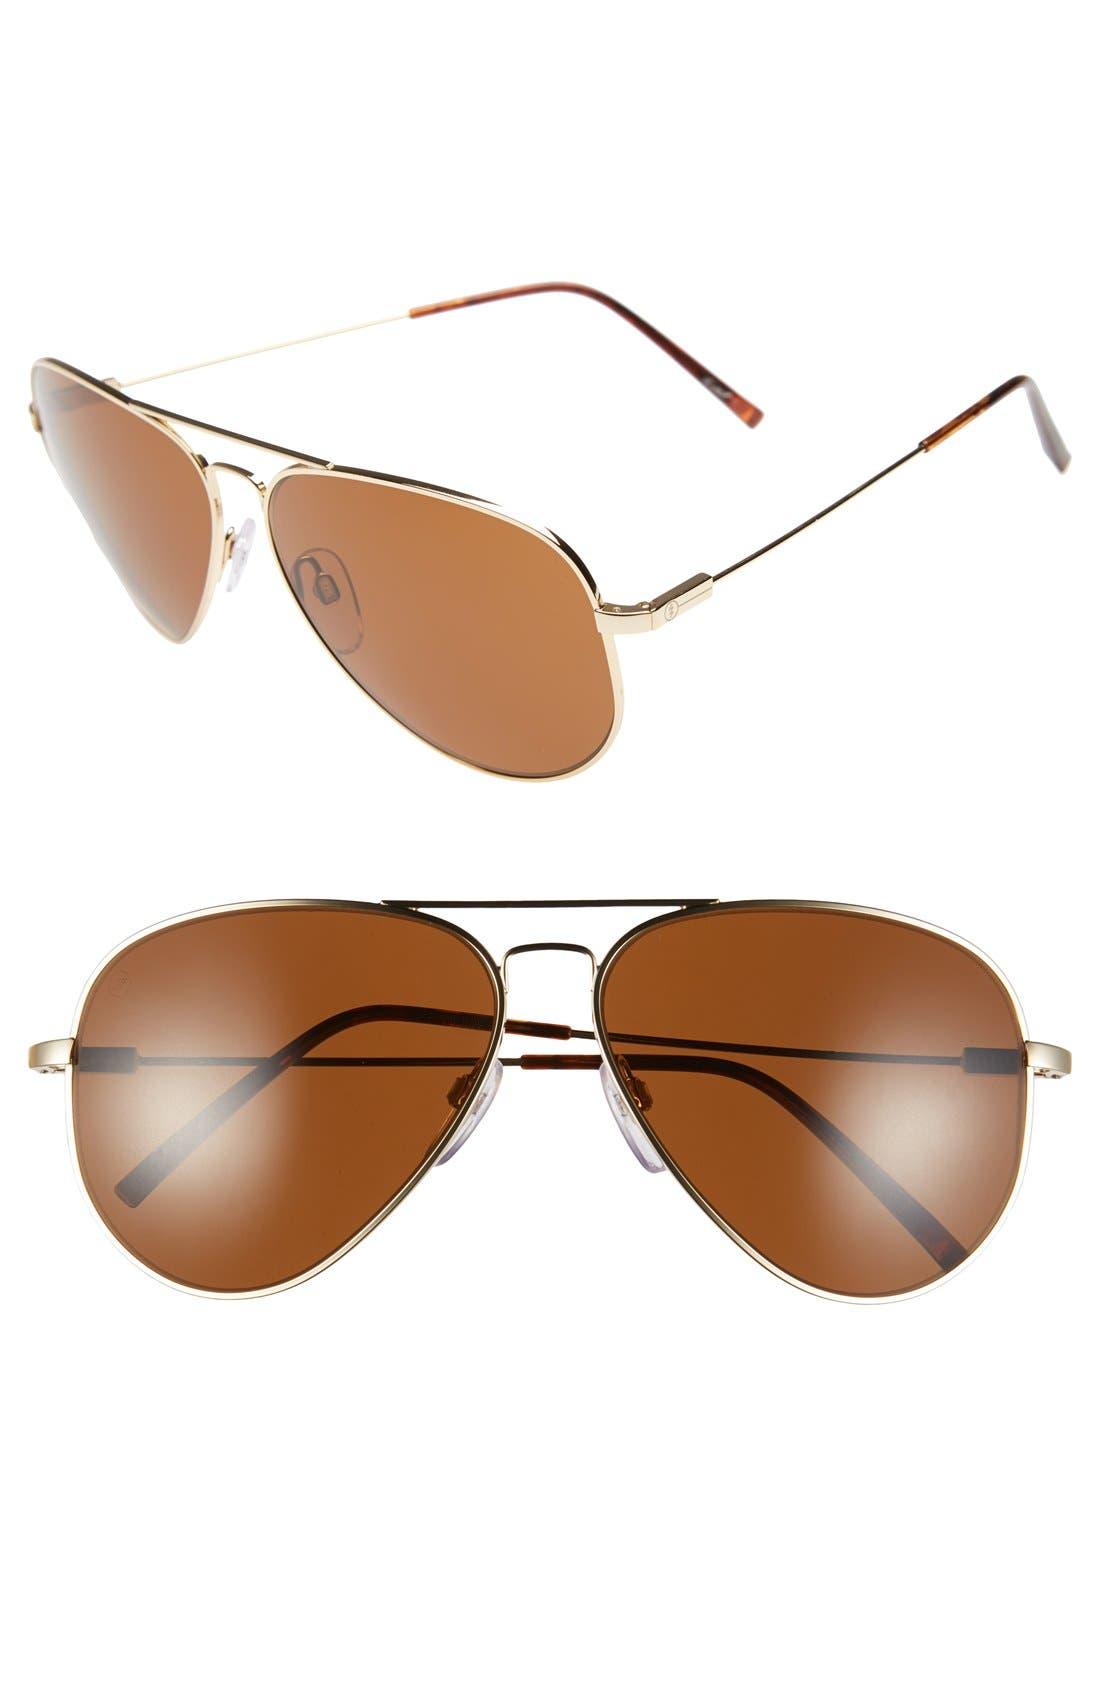 ELECTRIC 'AV1 XL' 62mm Aviator Sunglasses